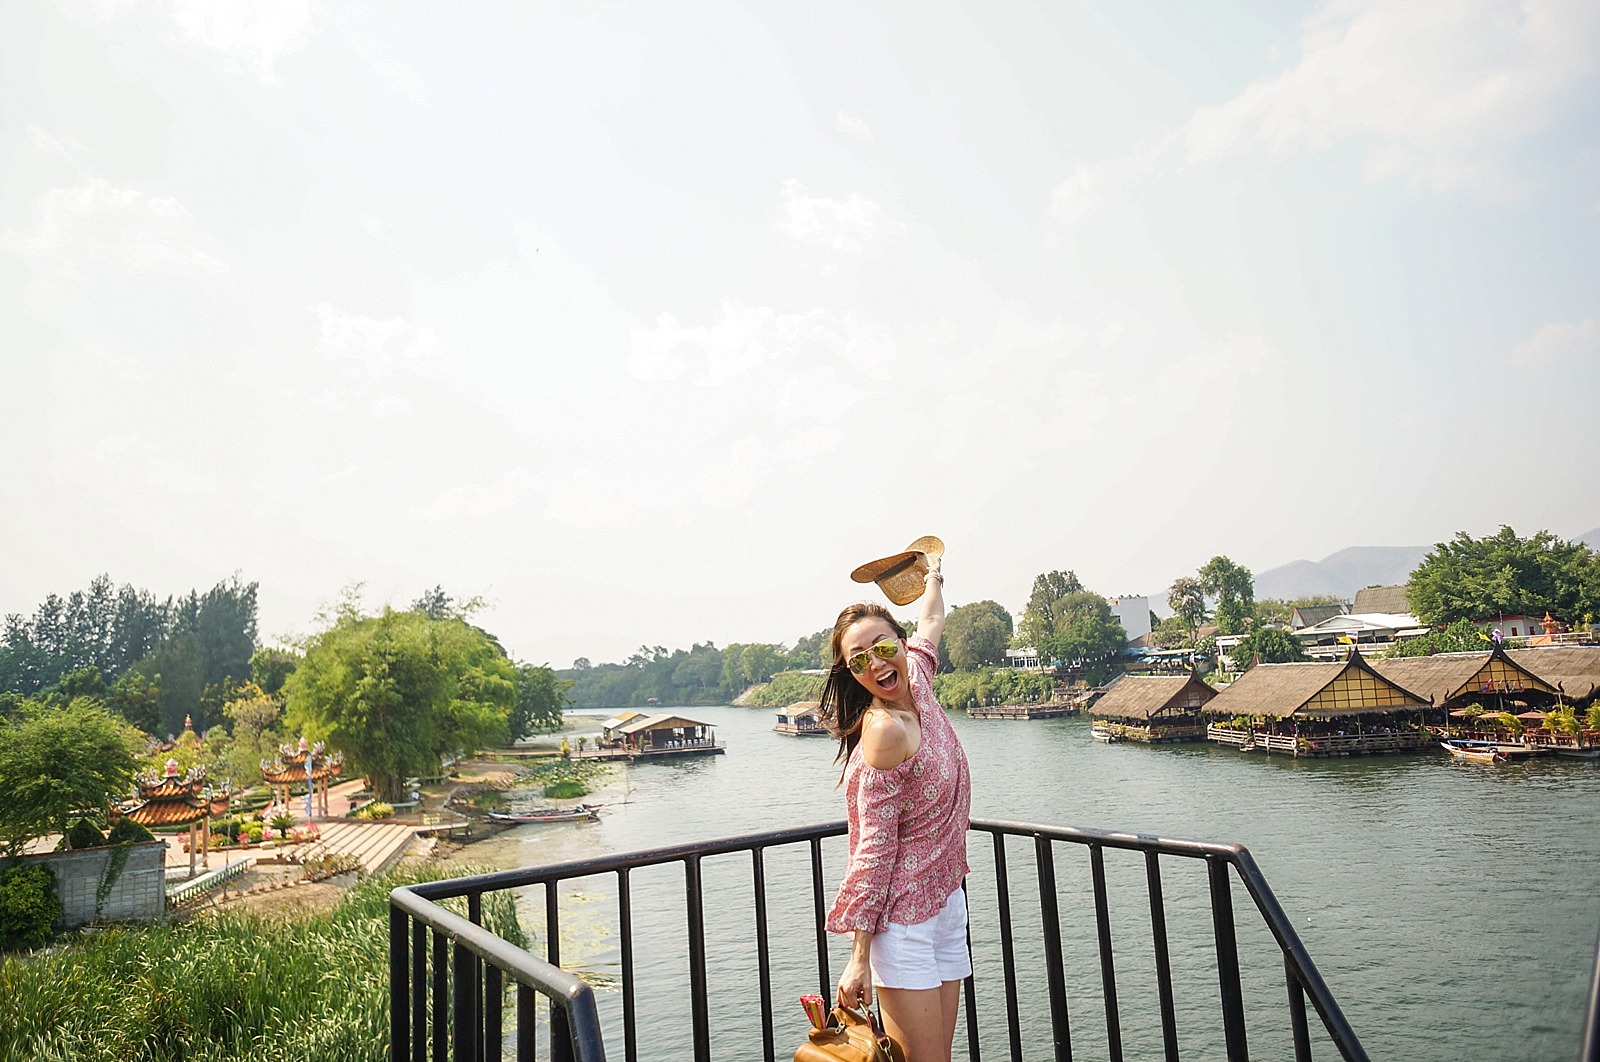 Thailand-diana-elizabeth-travel-blogger-phoenix-254